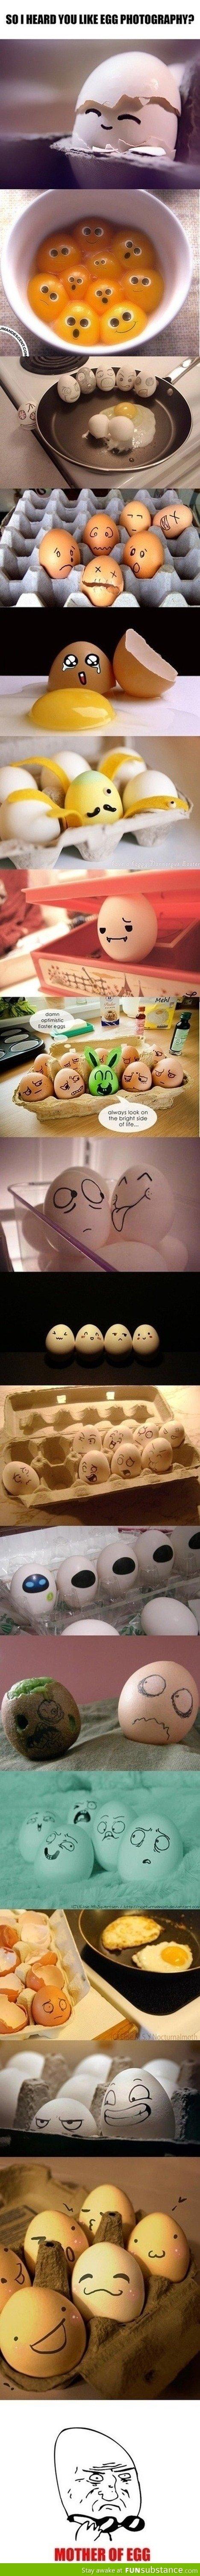 Awesome Egg Art. .